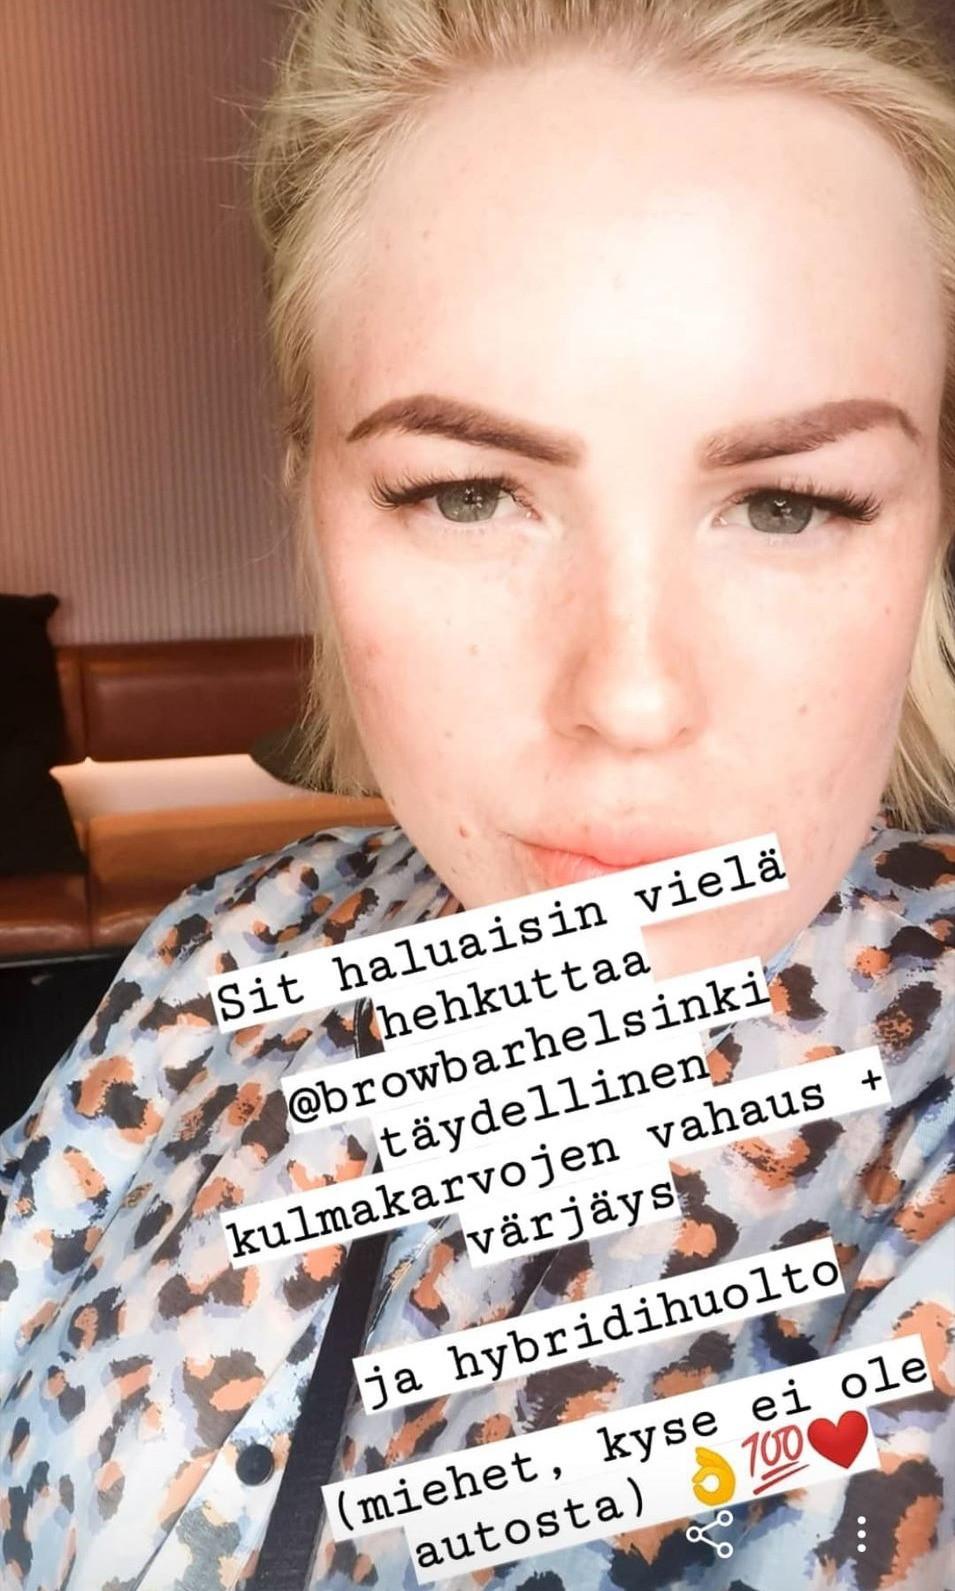 Hybridiripsienpidennys browbar Helsinki